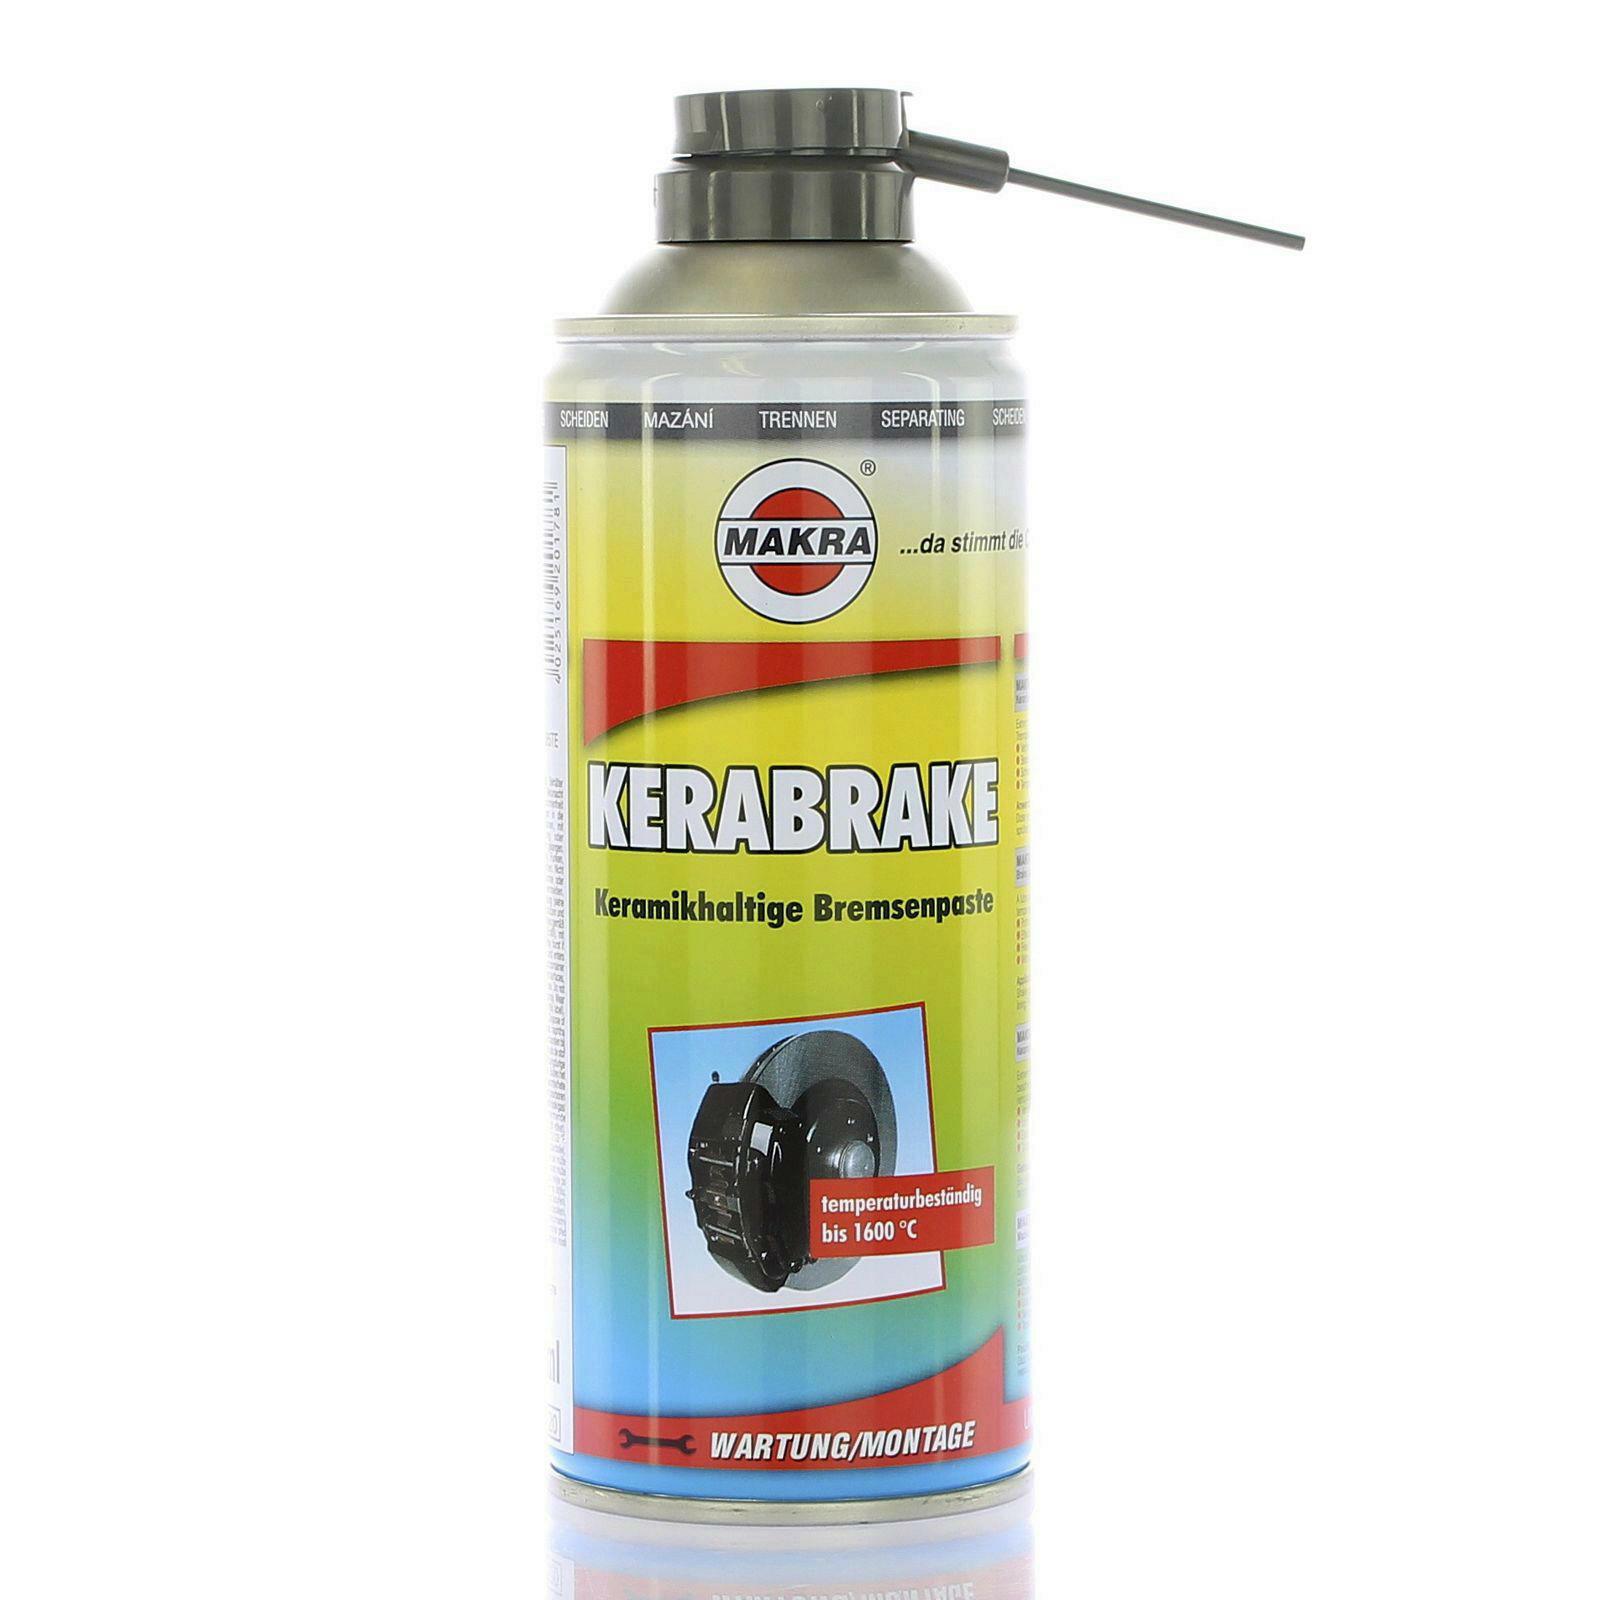 MAKRA KERABRAKE 400ml Montagespray Montagepaste Bremse